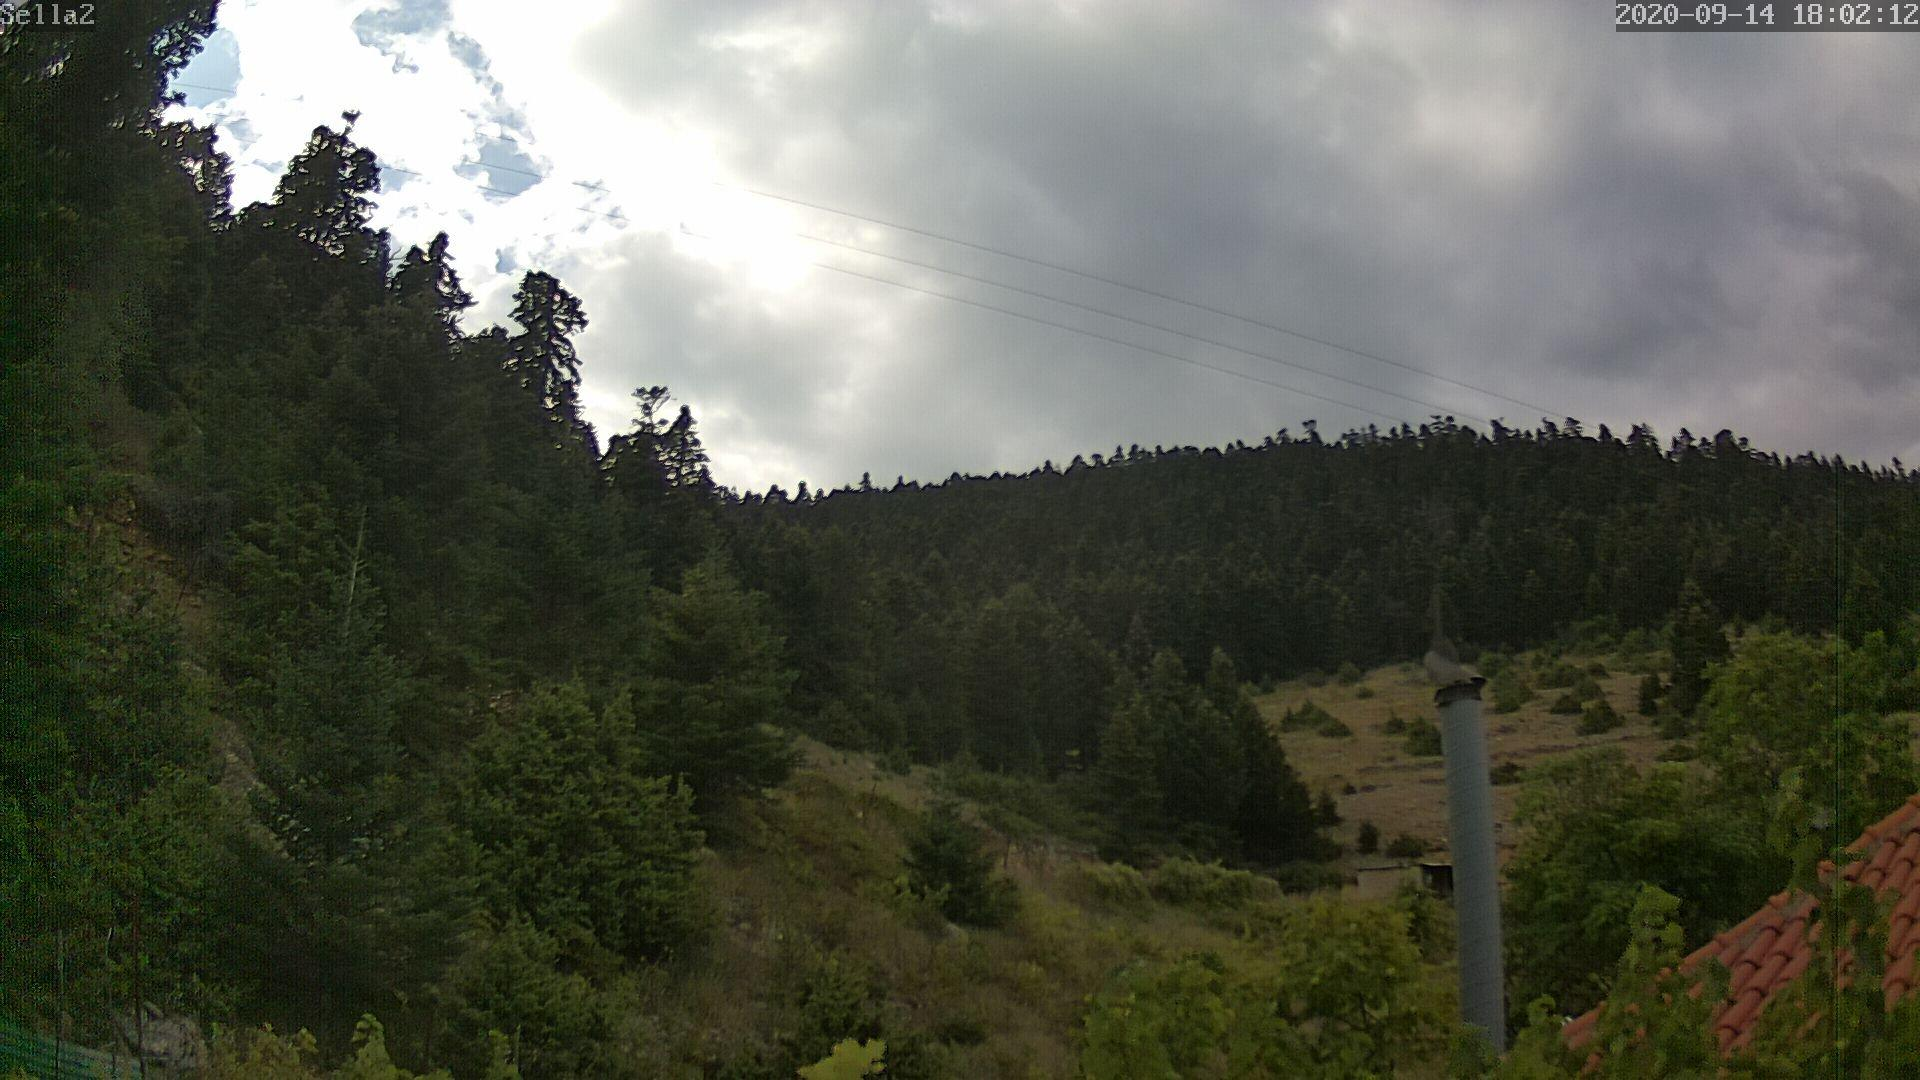 Webcam Σελλά: Ευρυτανίας